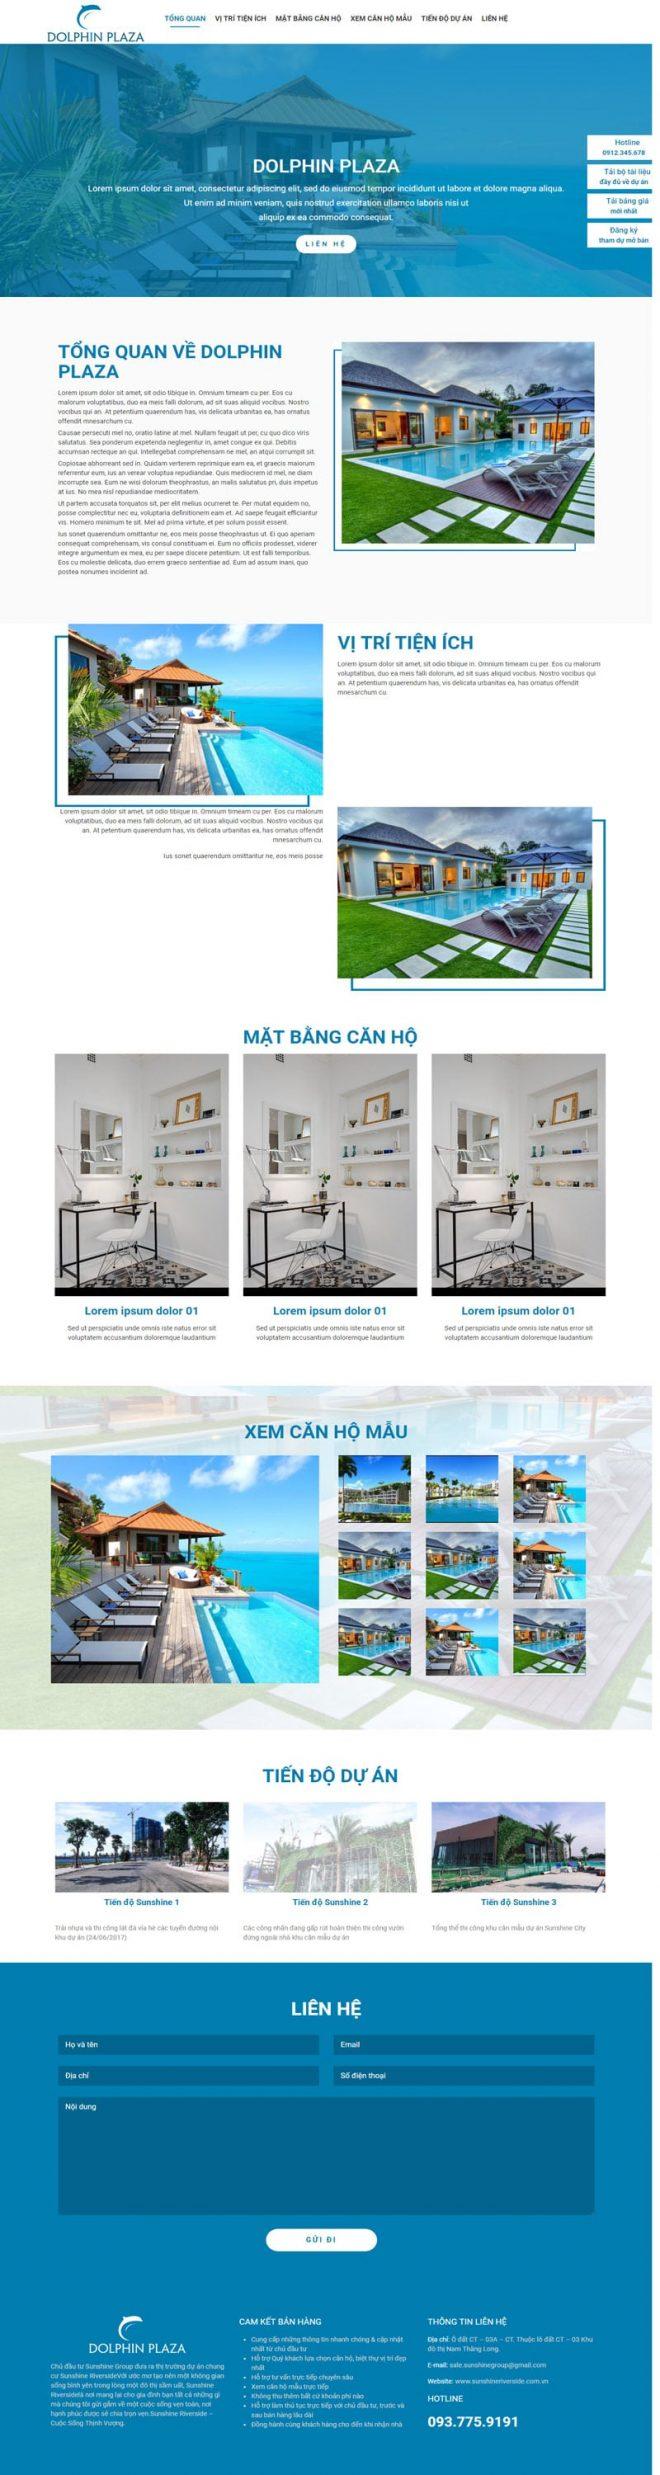 screencapture-batdongsan-mediaworks-vn-du-an-dolphin-plaza-1500520891047